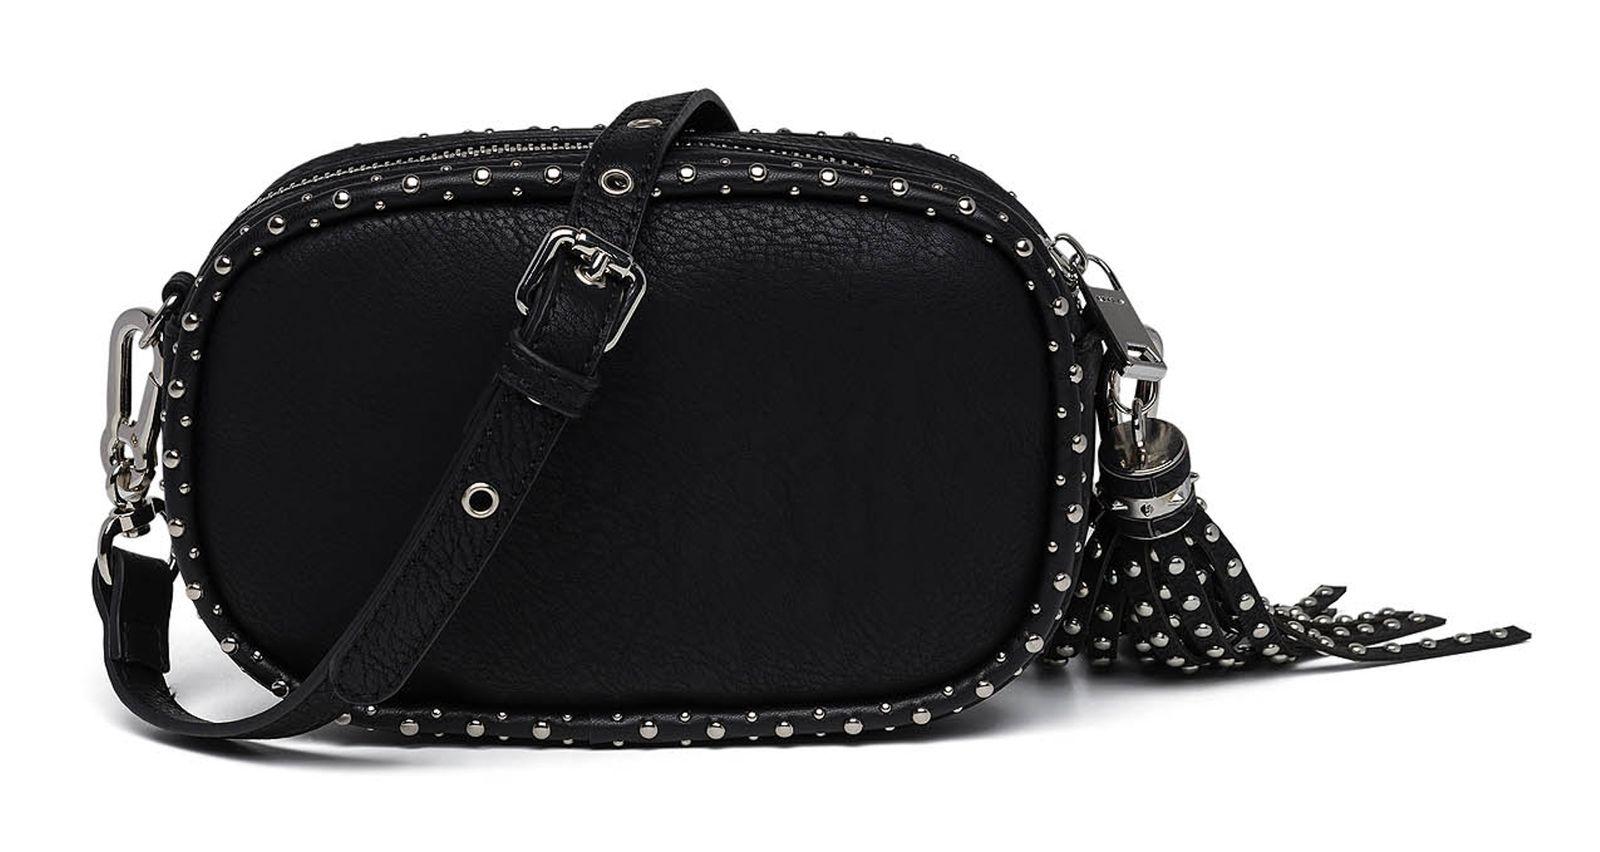 abb699bc9a03 A0180B.261REPLAY Eco-Leather Crossbody Bag Black   89